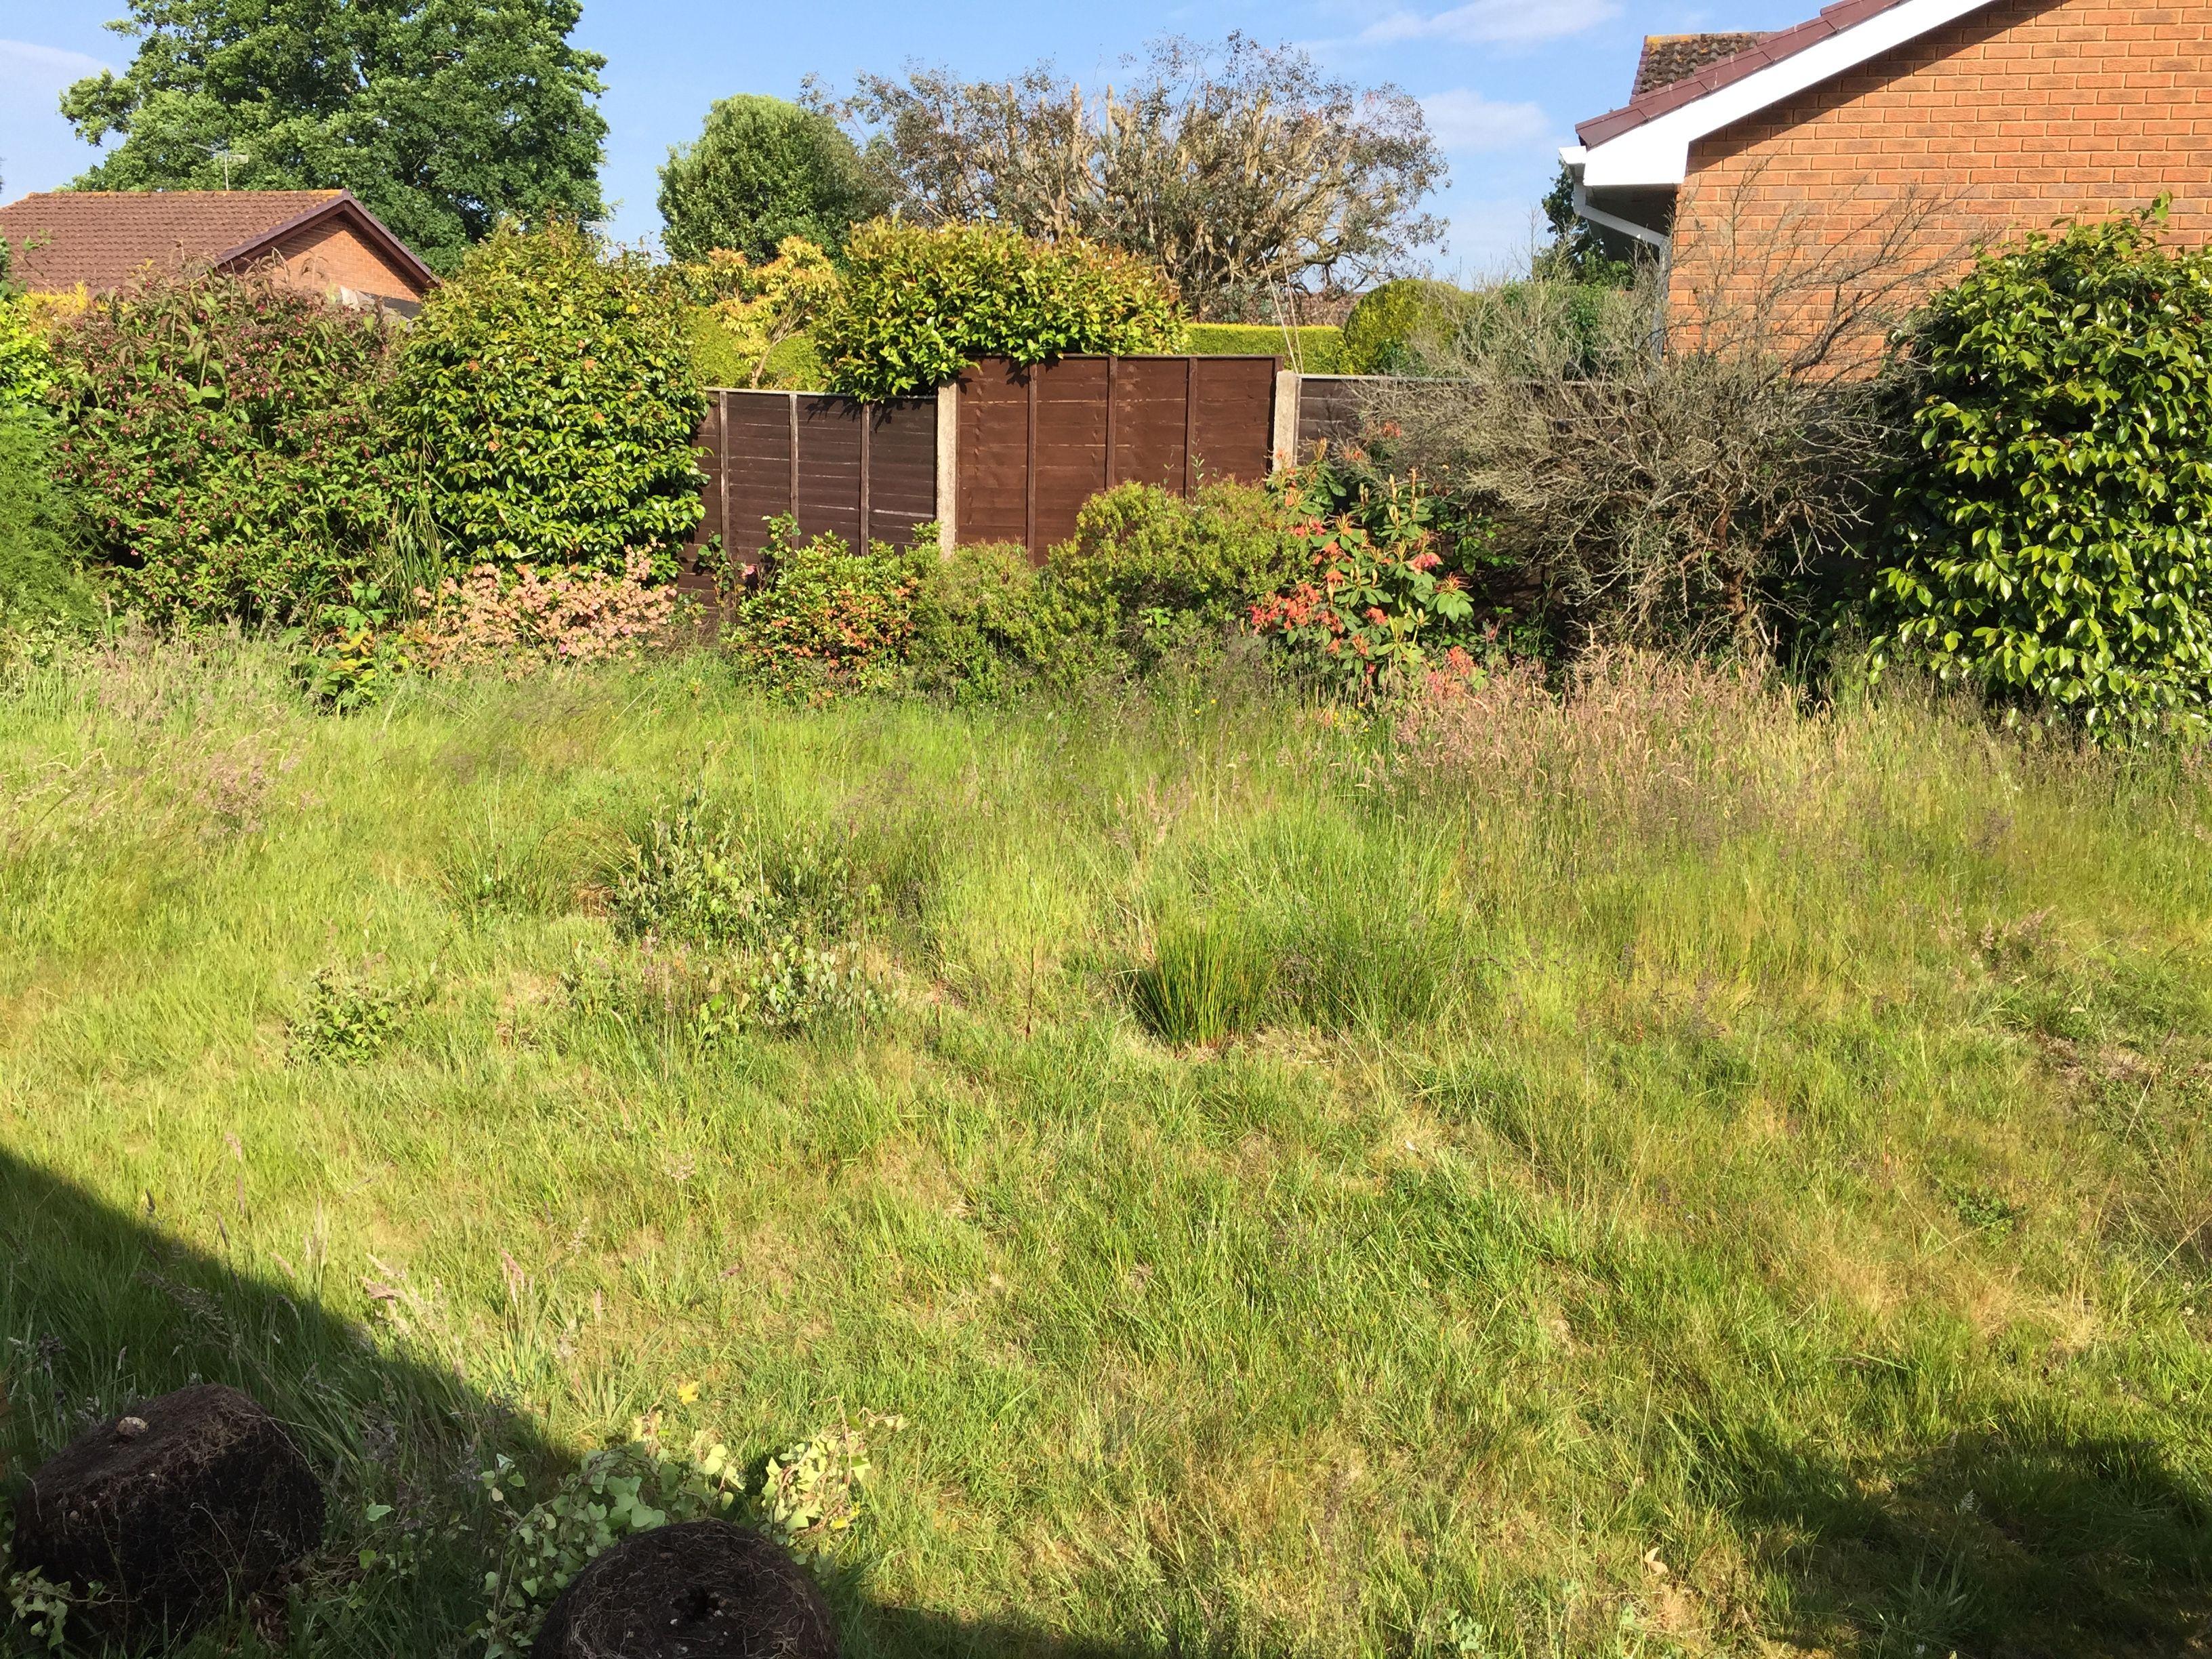 Landscape Gardeners Bournemouth Landscape gardener bournemouth summer house bournemouth landscape gardener bournemouth workwithnaturefo